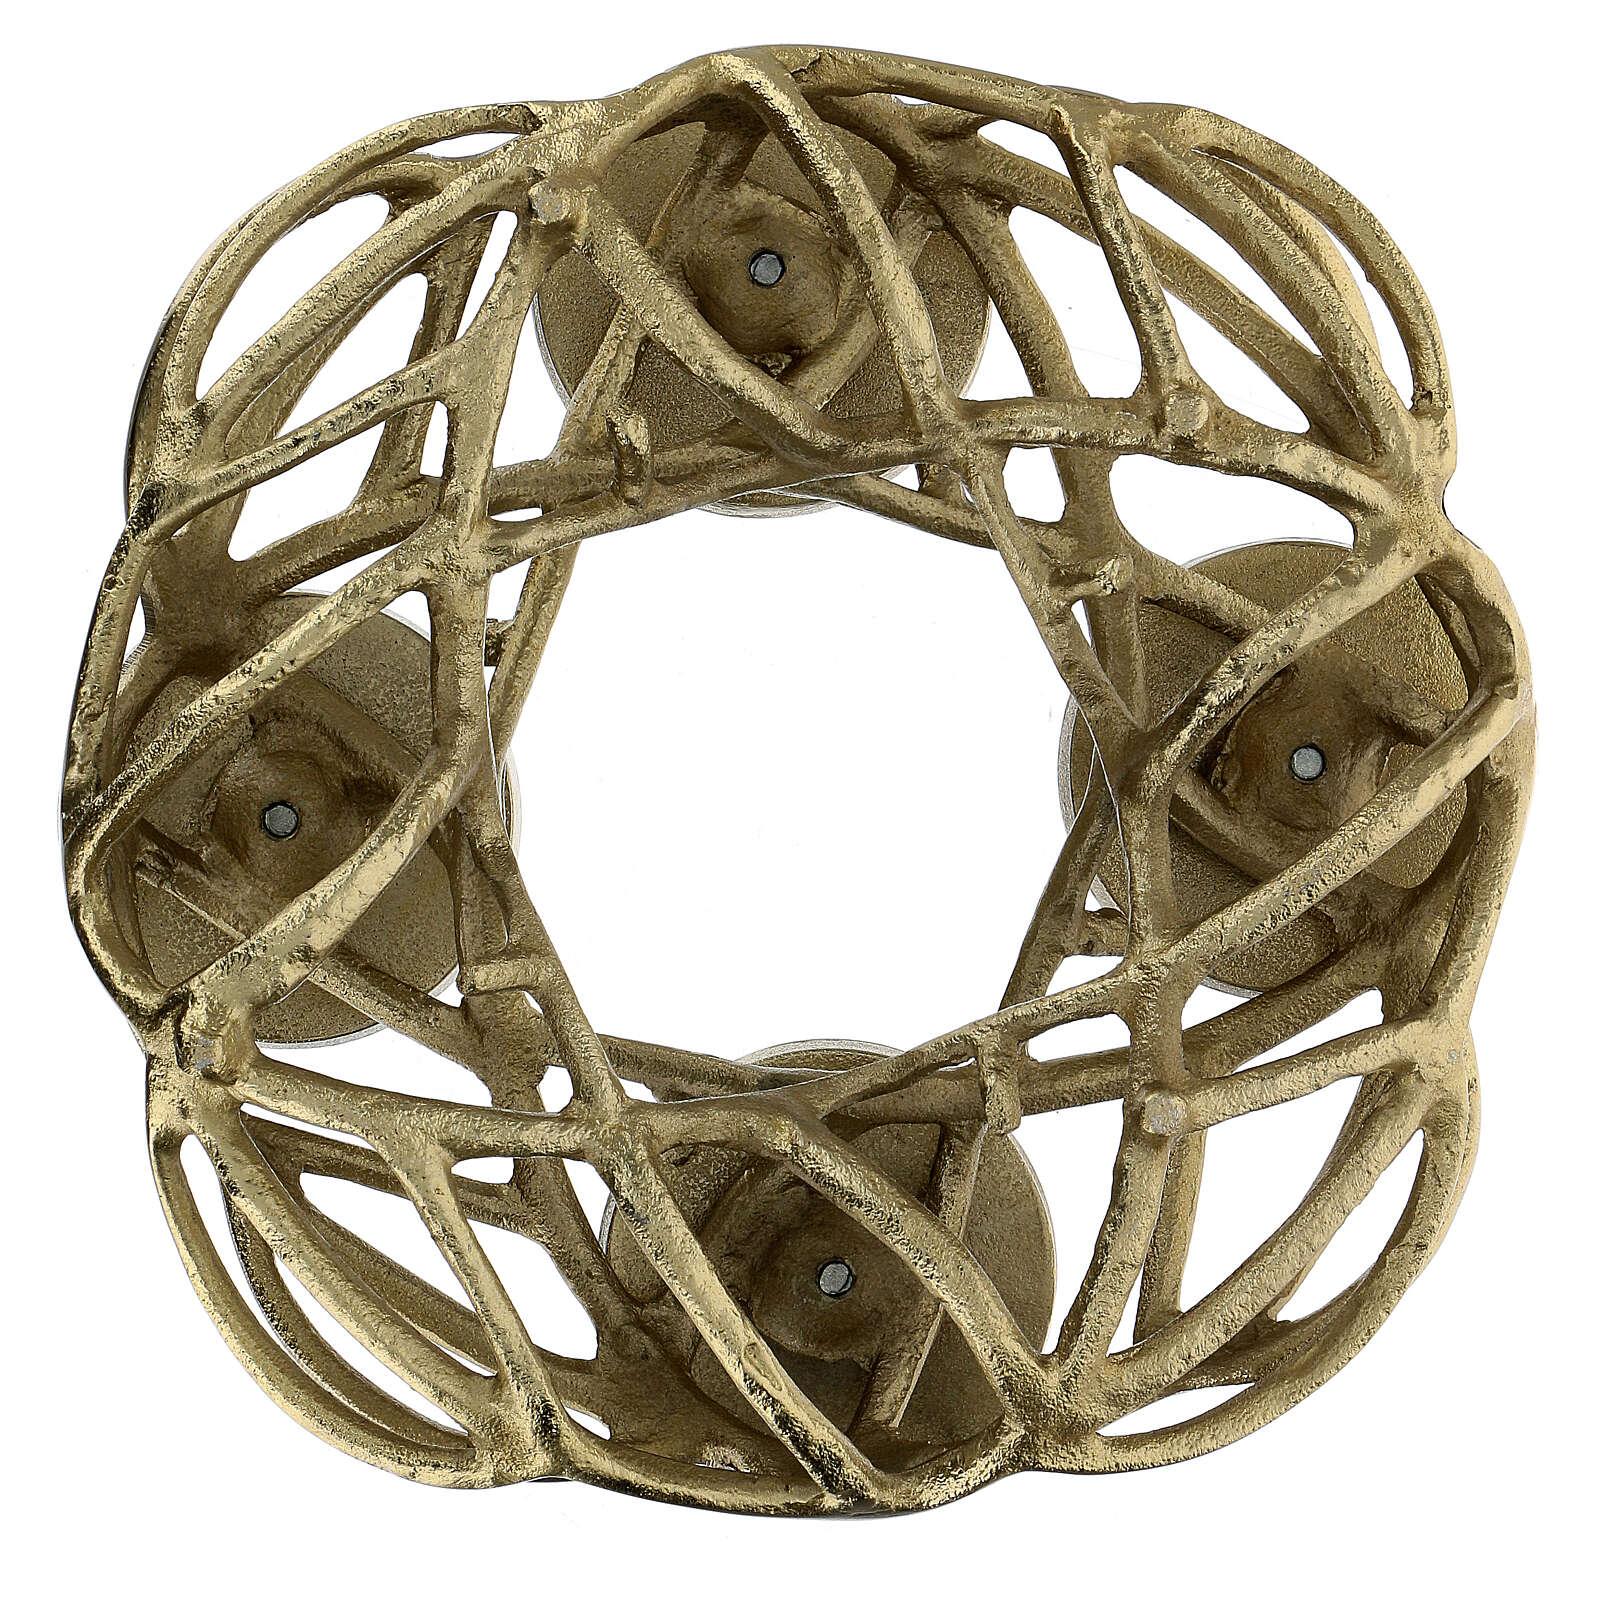 Corona Avvento metallo dorato  3